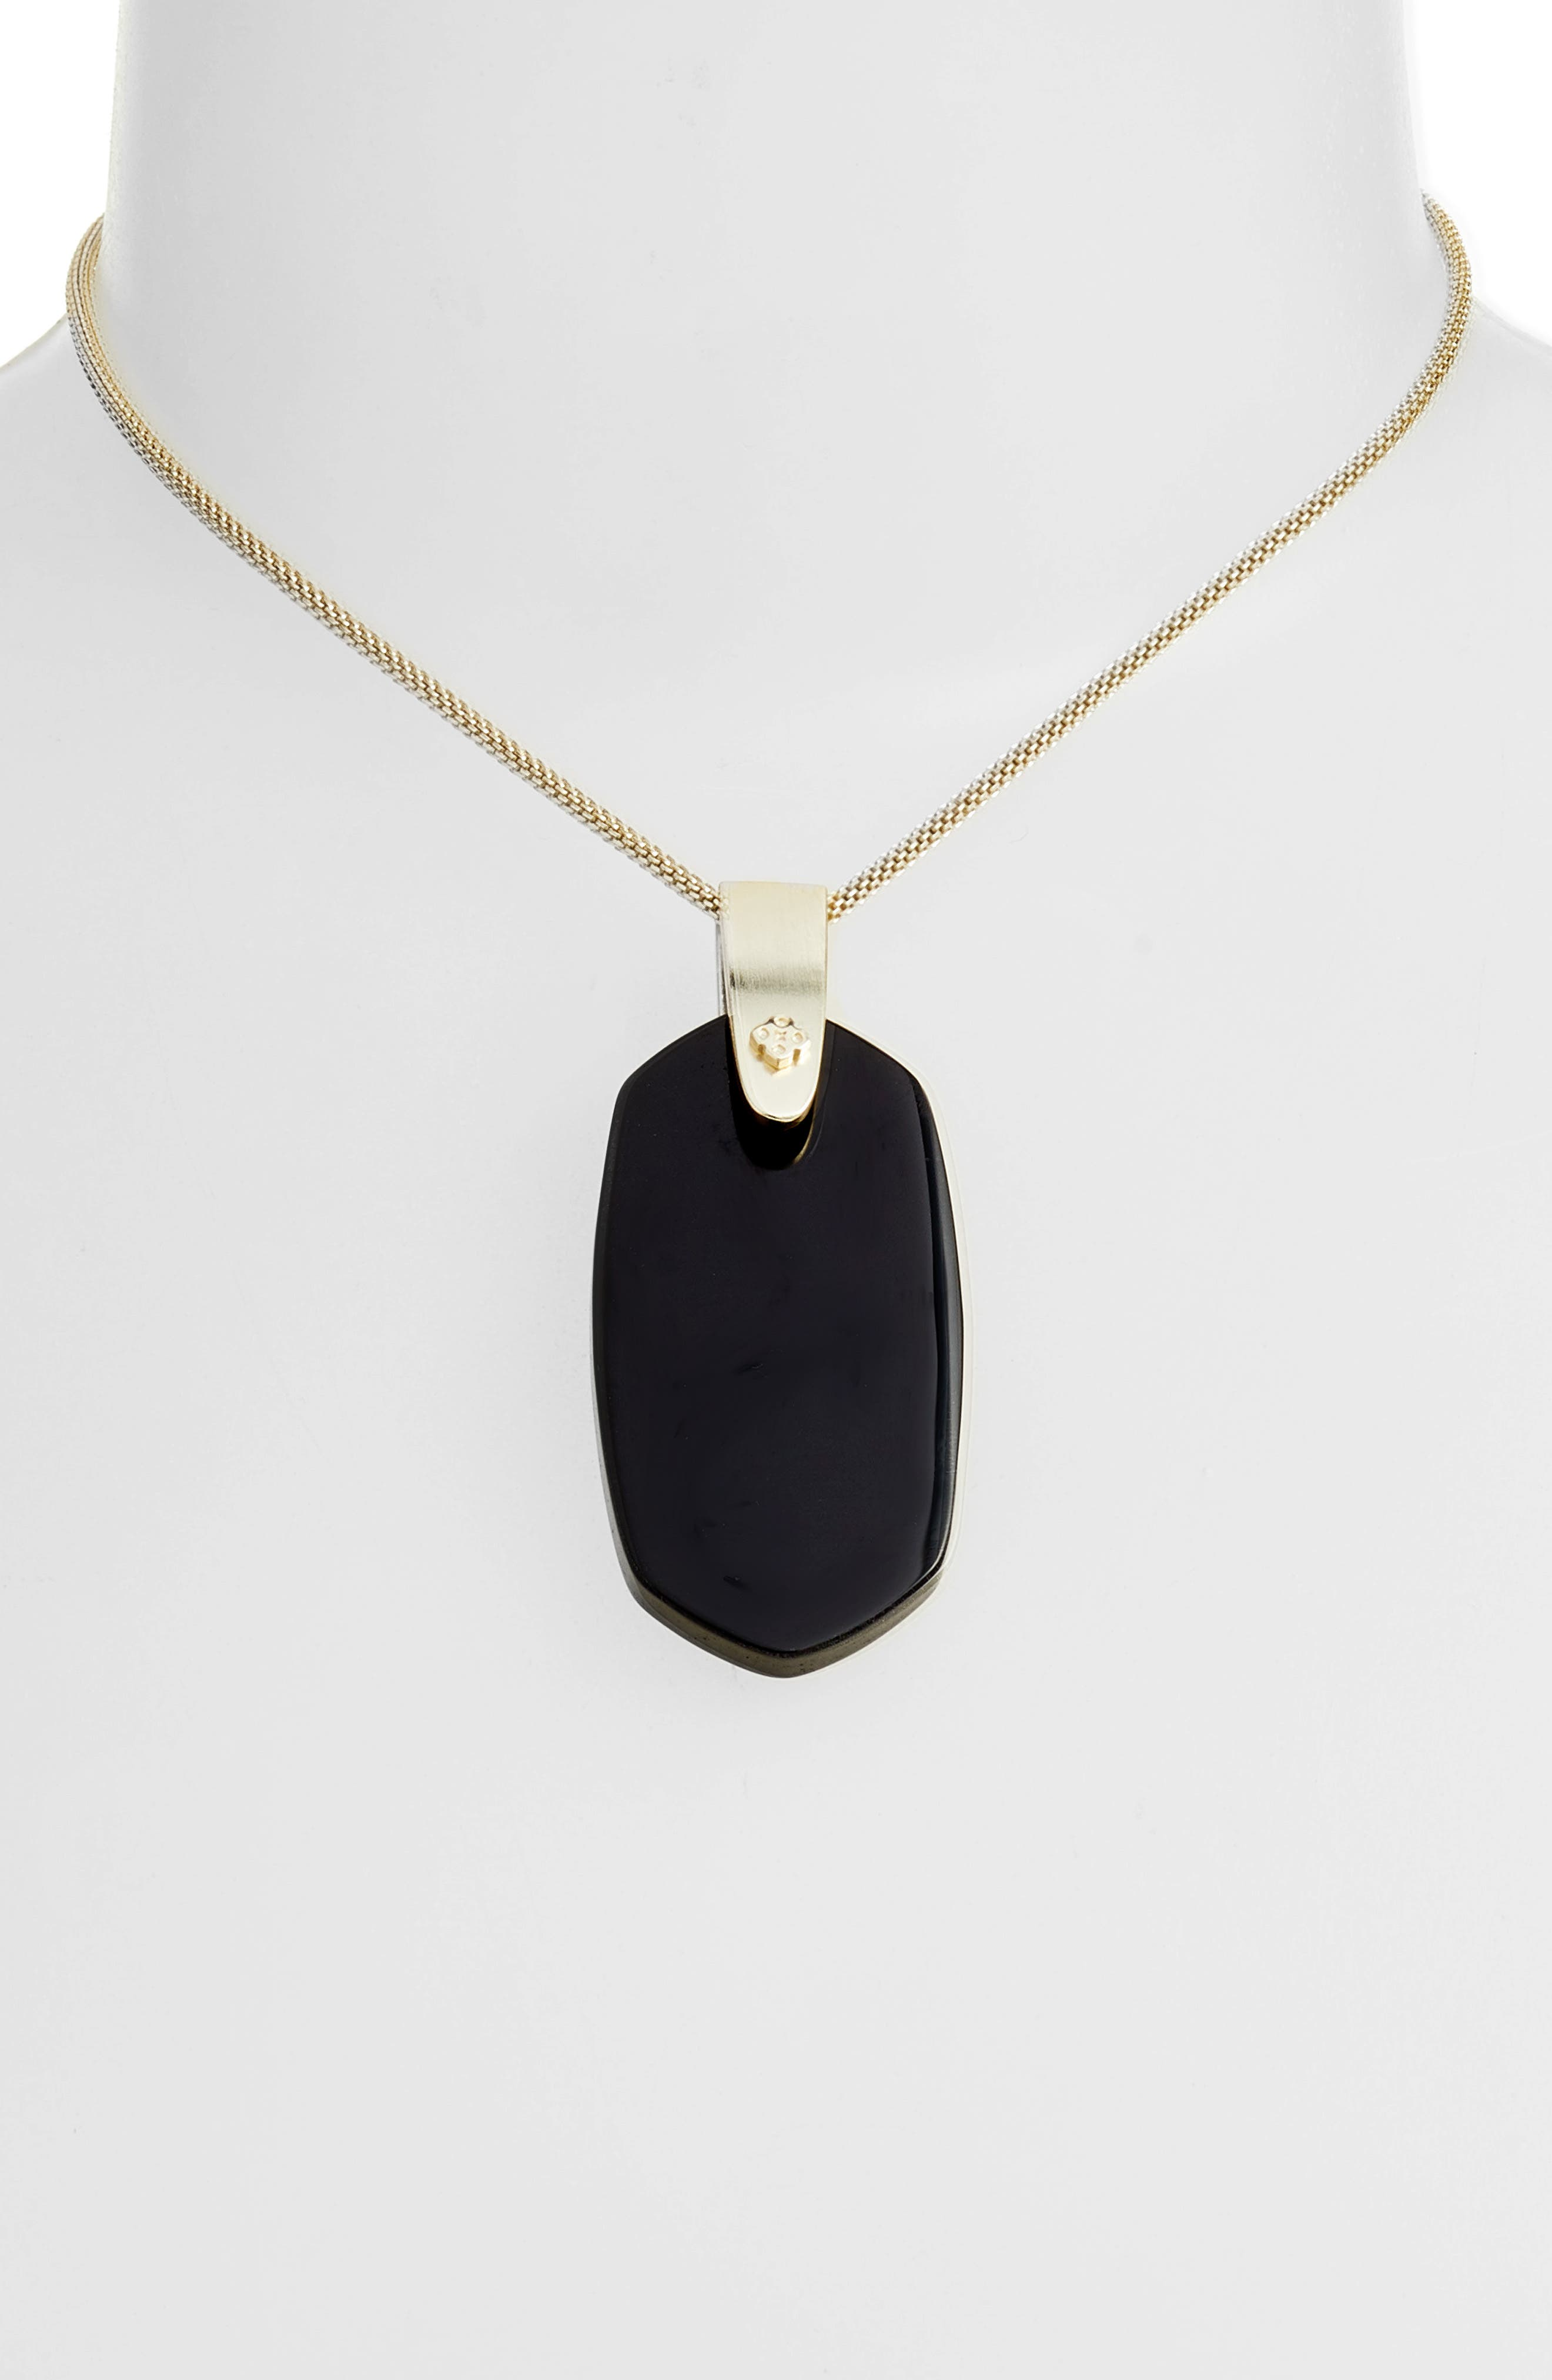 KENDRA SCOTT, Inez Pendant Necklace, Alternate thumbnail 2, color, BLACK/ GOLD